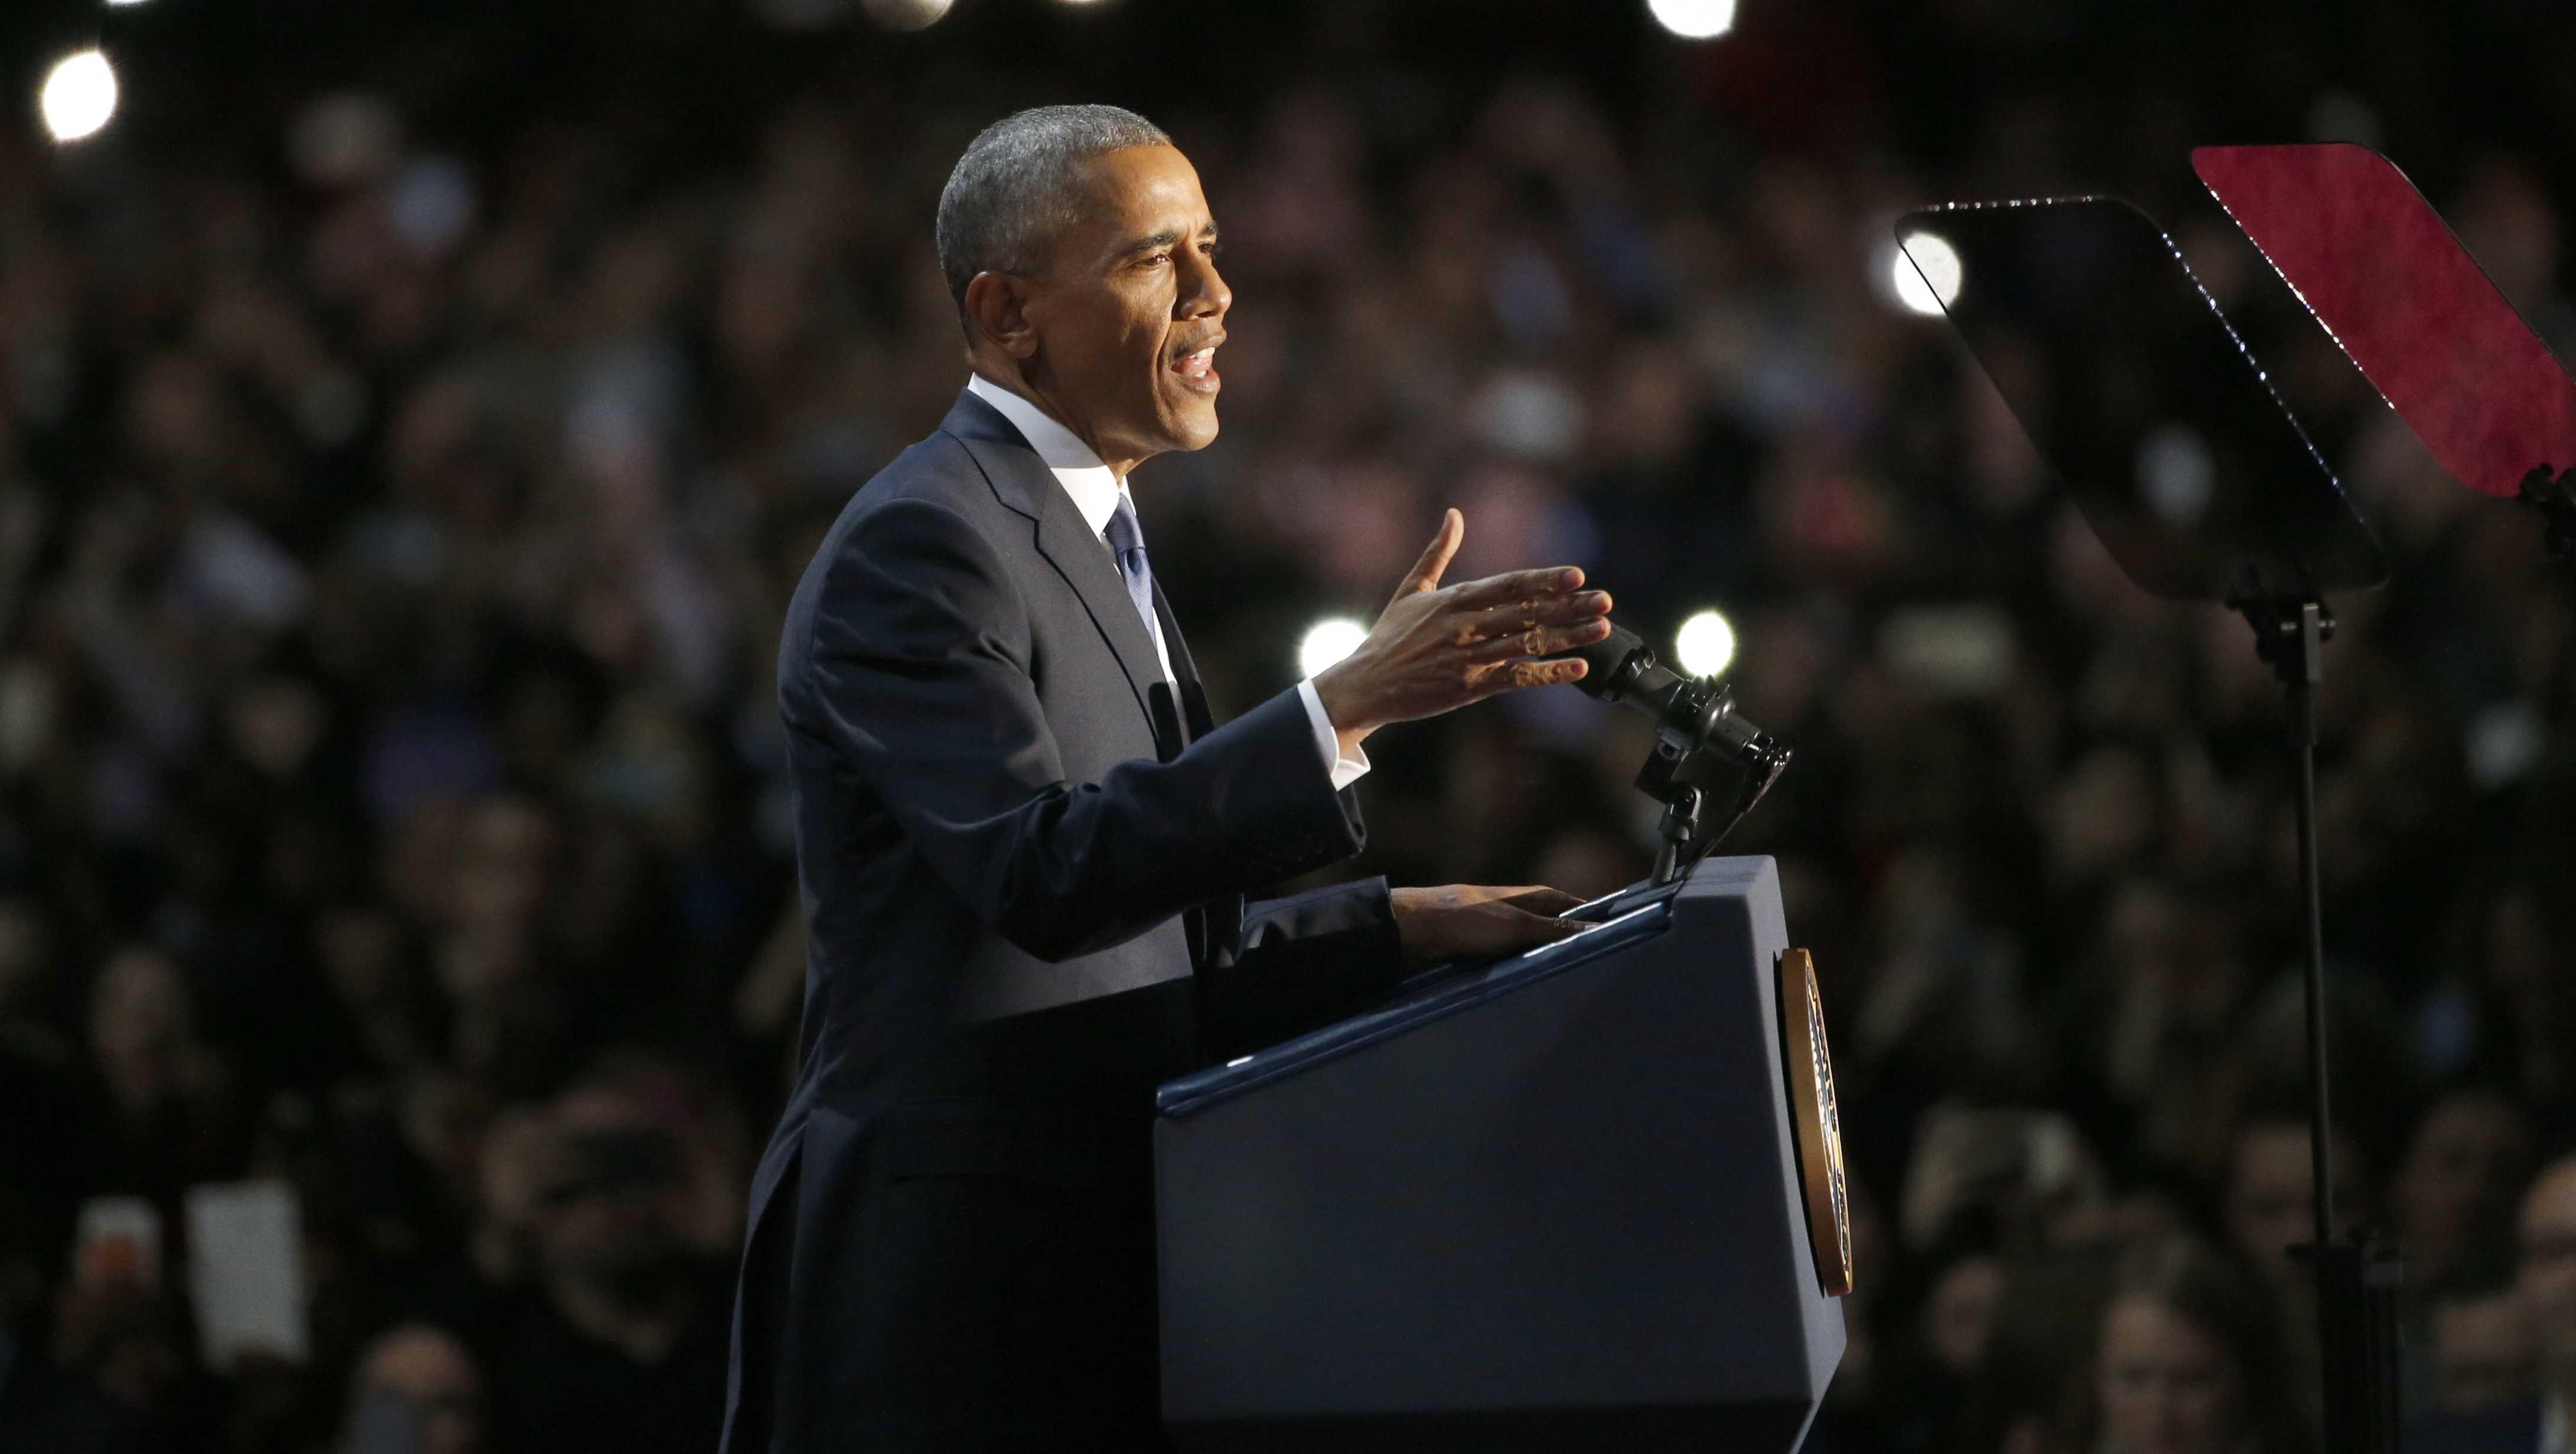 President Barack Obama delivered his farewell address in Chicago.